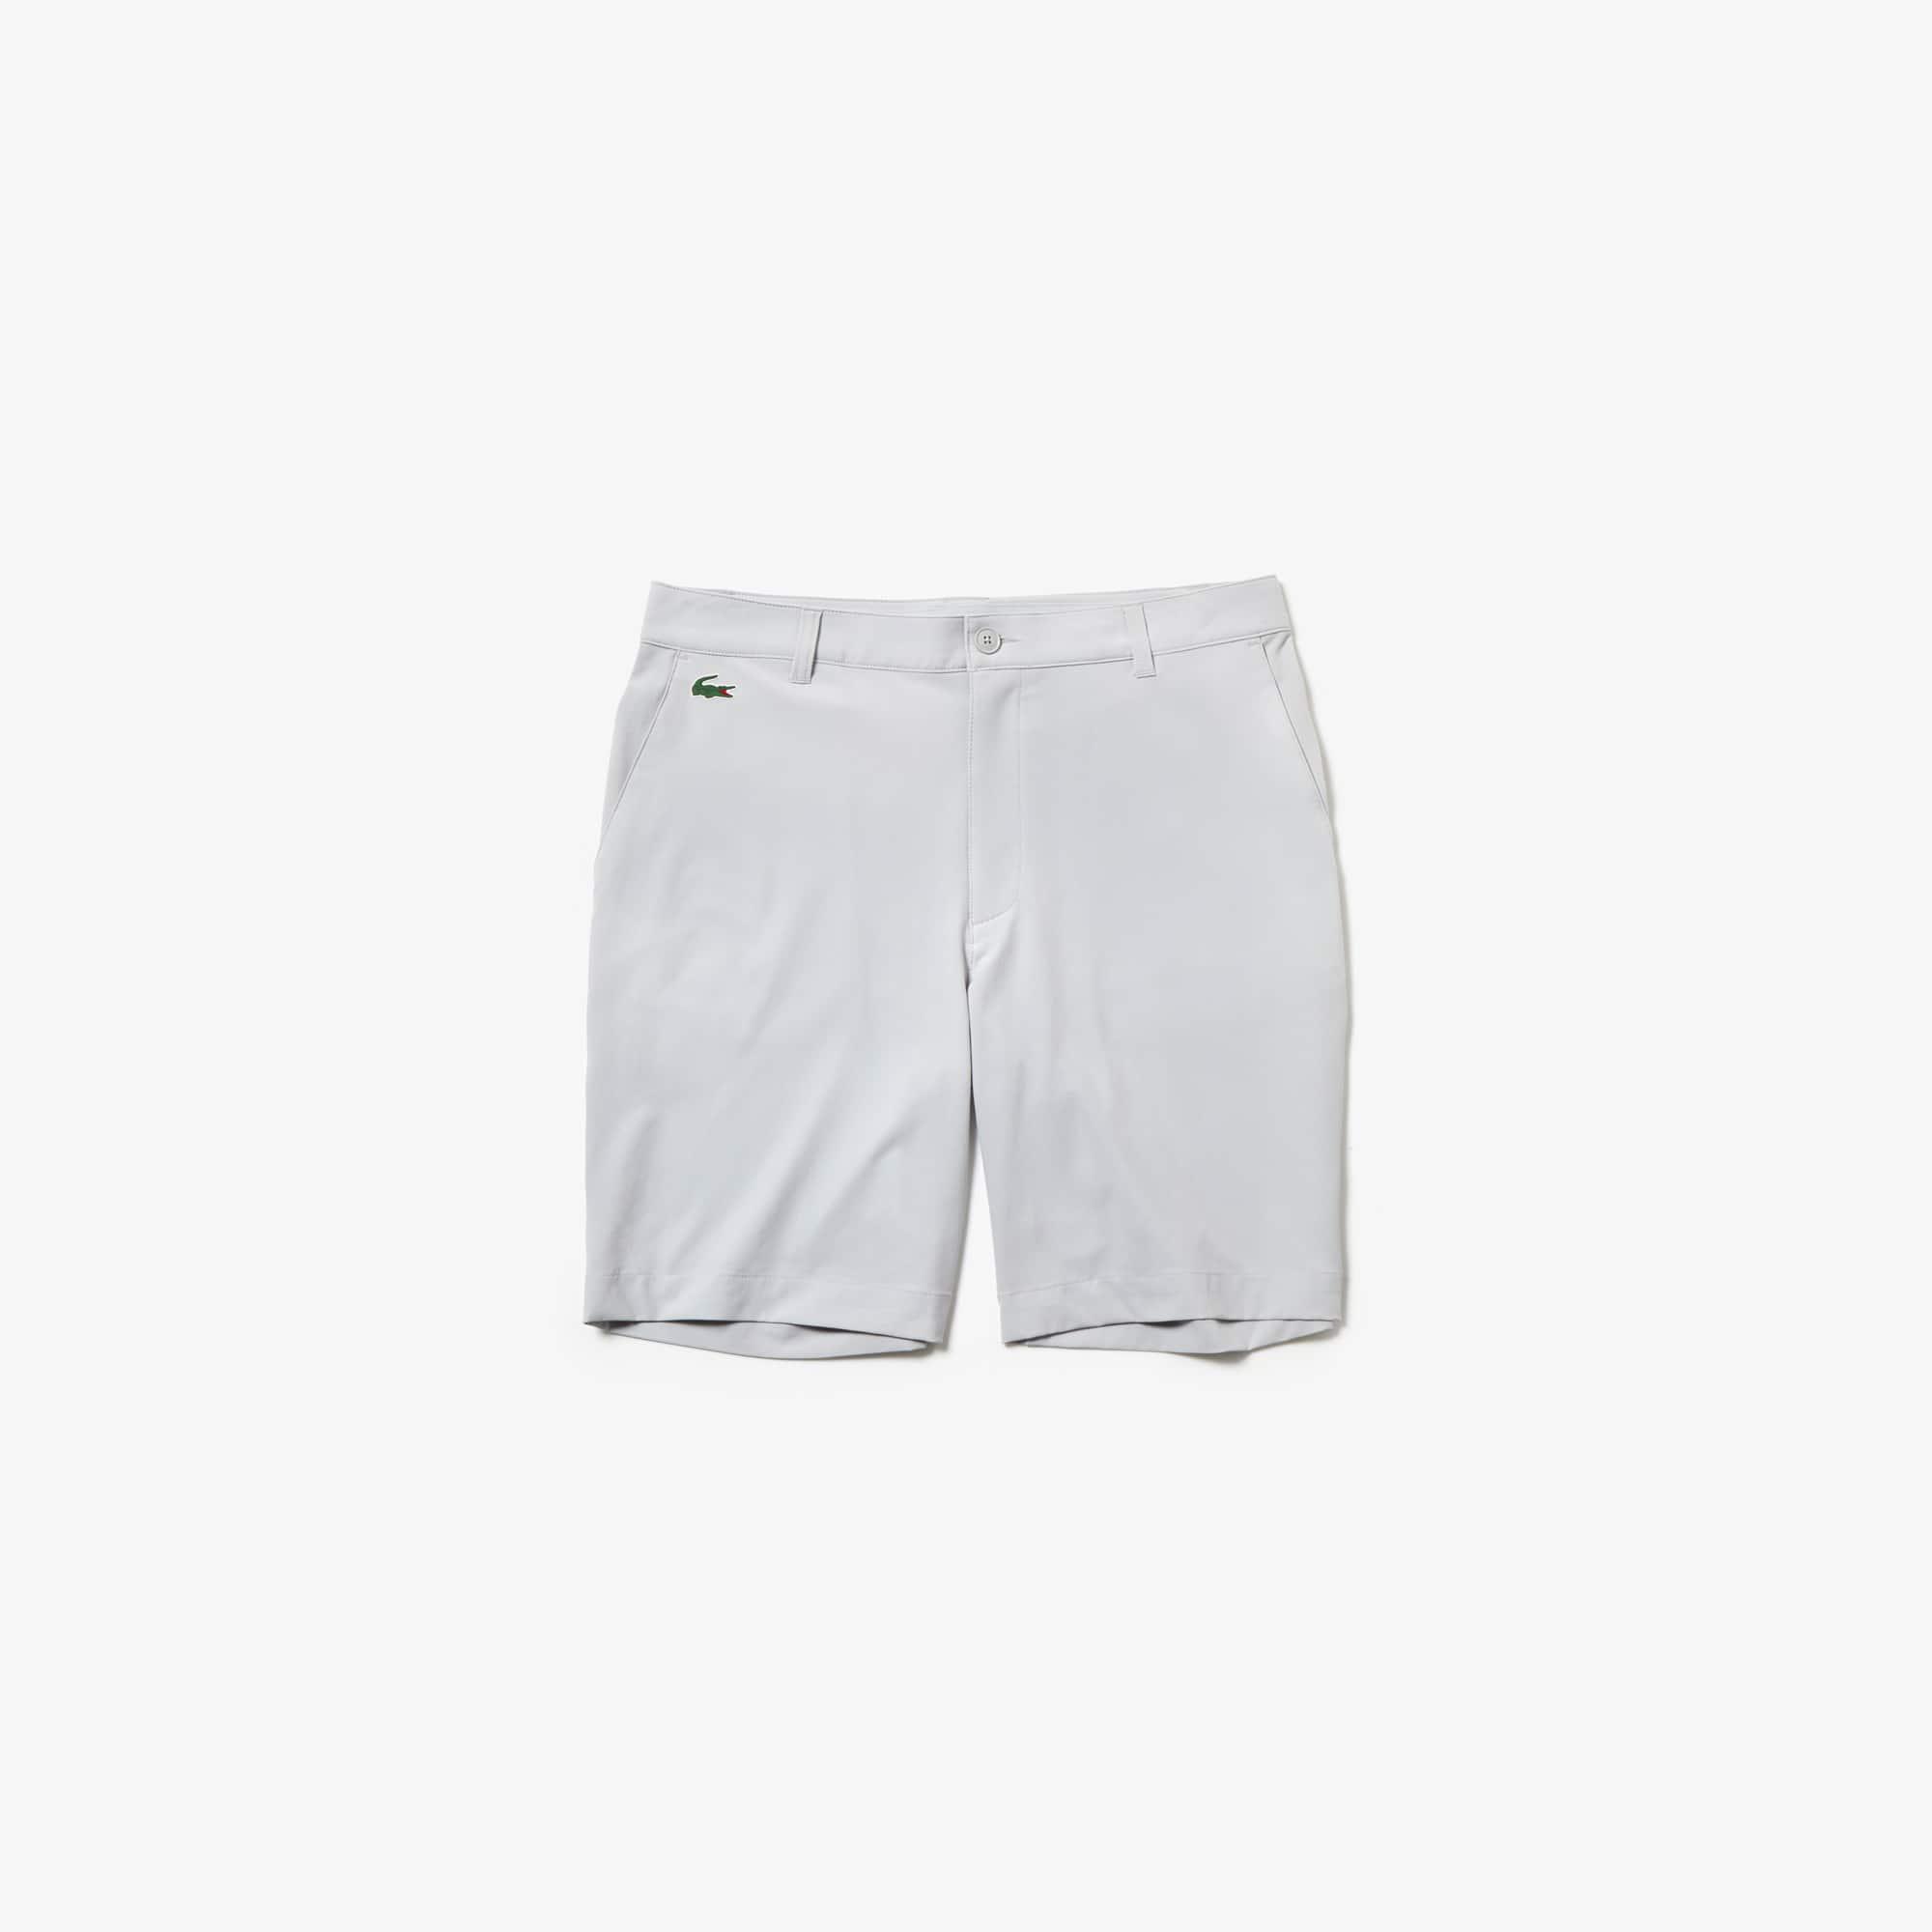 Men's SPORT Stretch Taffeta Technical Golf Bermuda Shorts